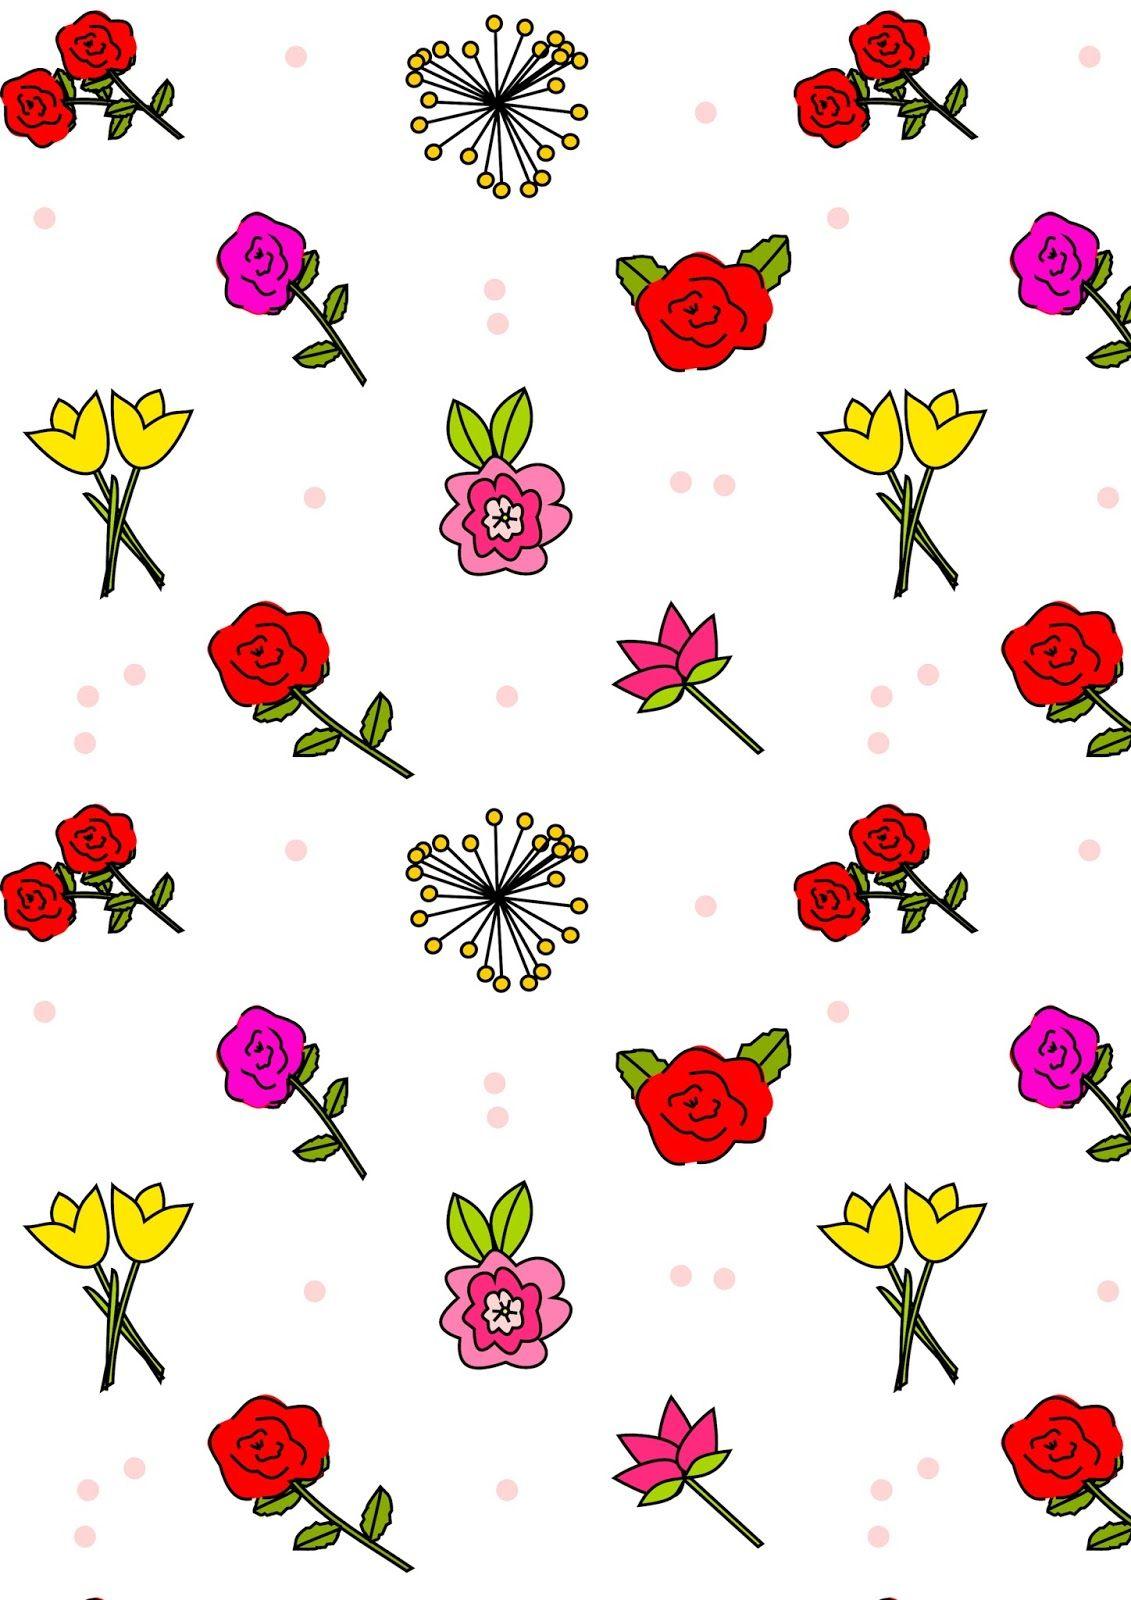 Paper Flower Patterns Free Yelomphonecompany